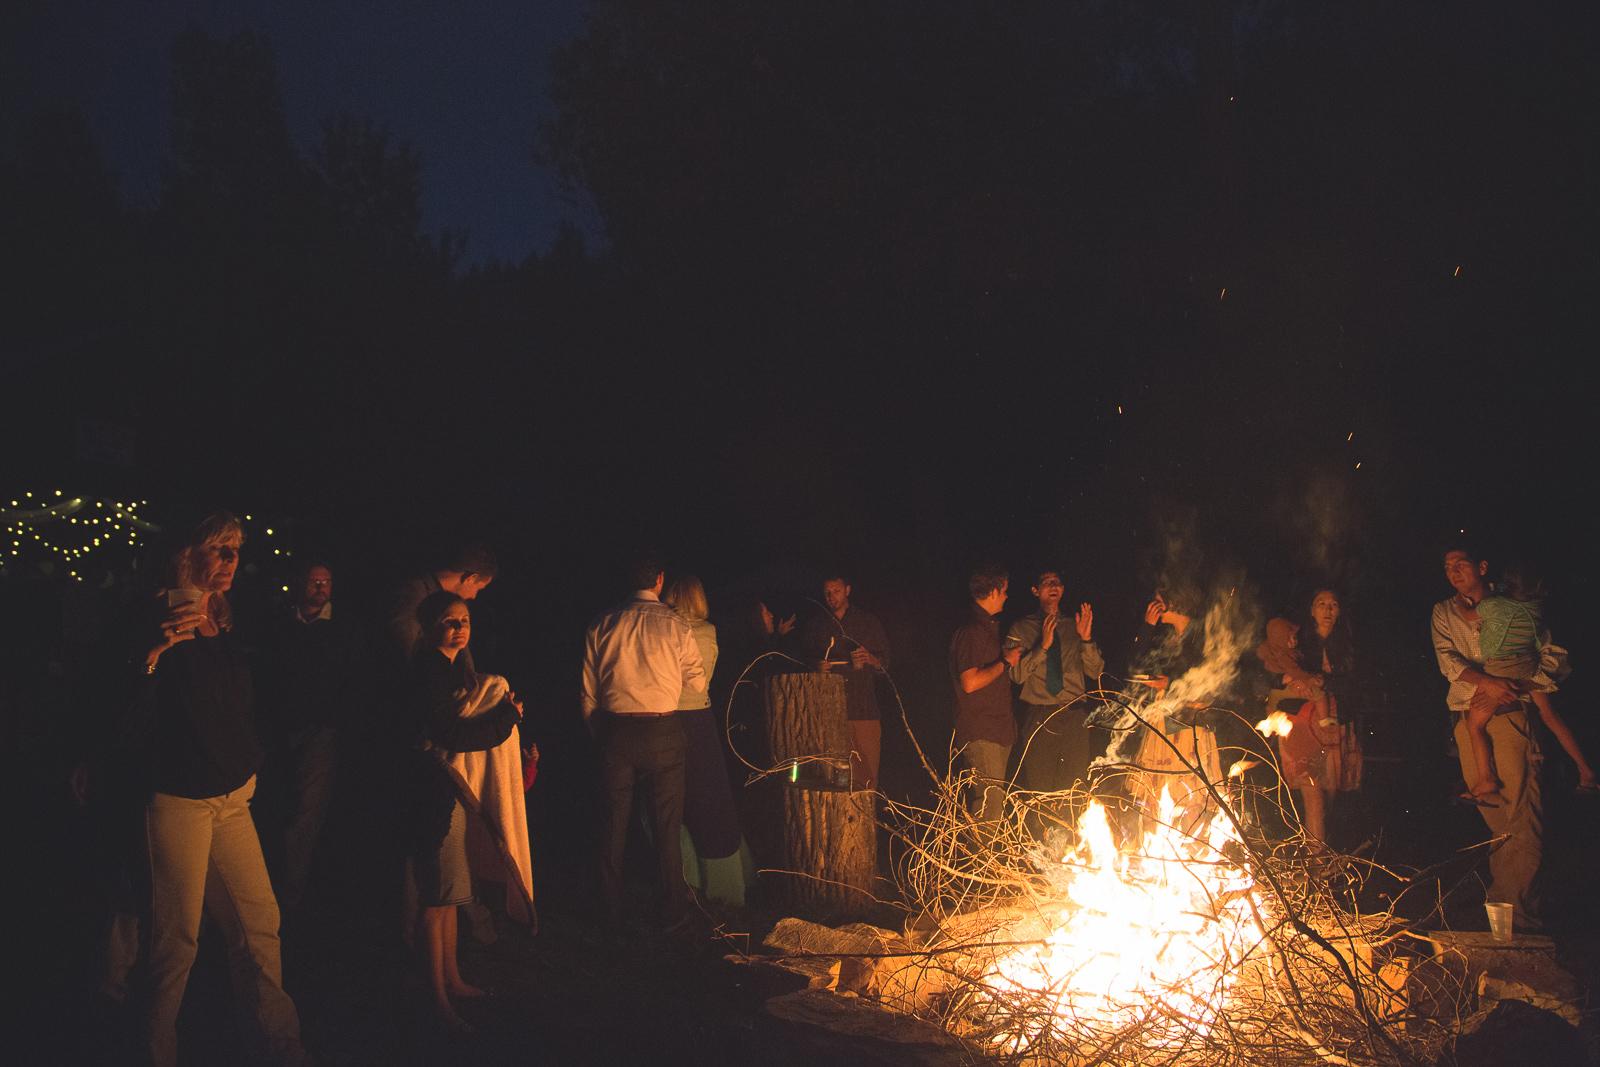 199-wedding-fun-photography-reception-unique-nature-trees-dancing